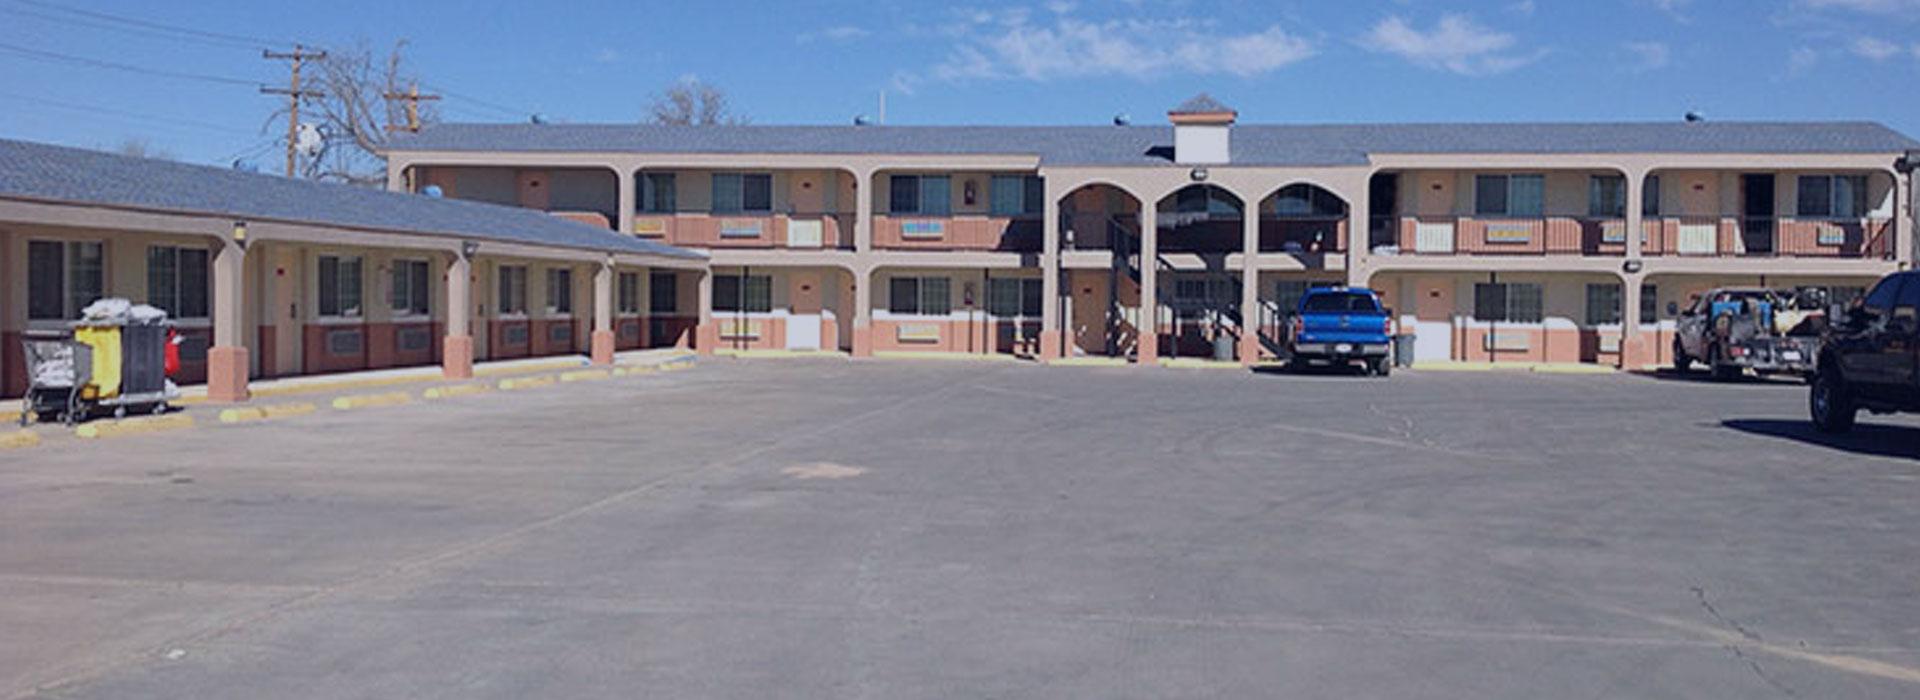 Best Motels Accommodation Hotels Near Me Kermit Texas